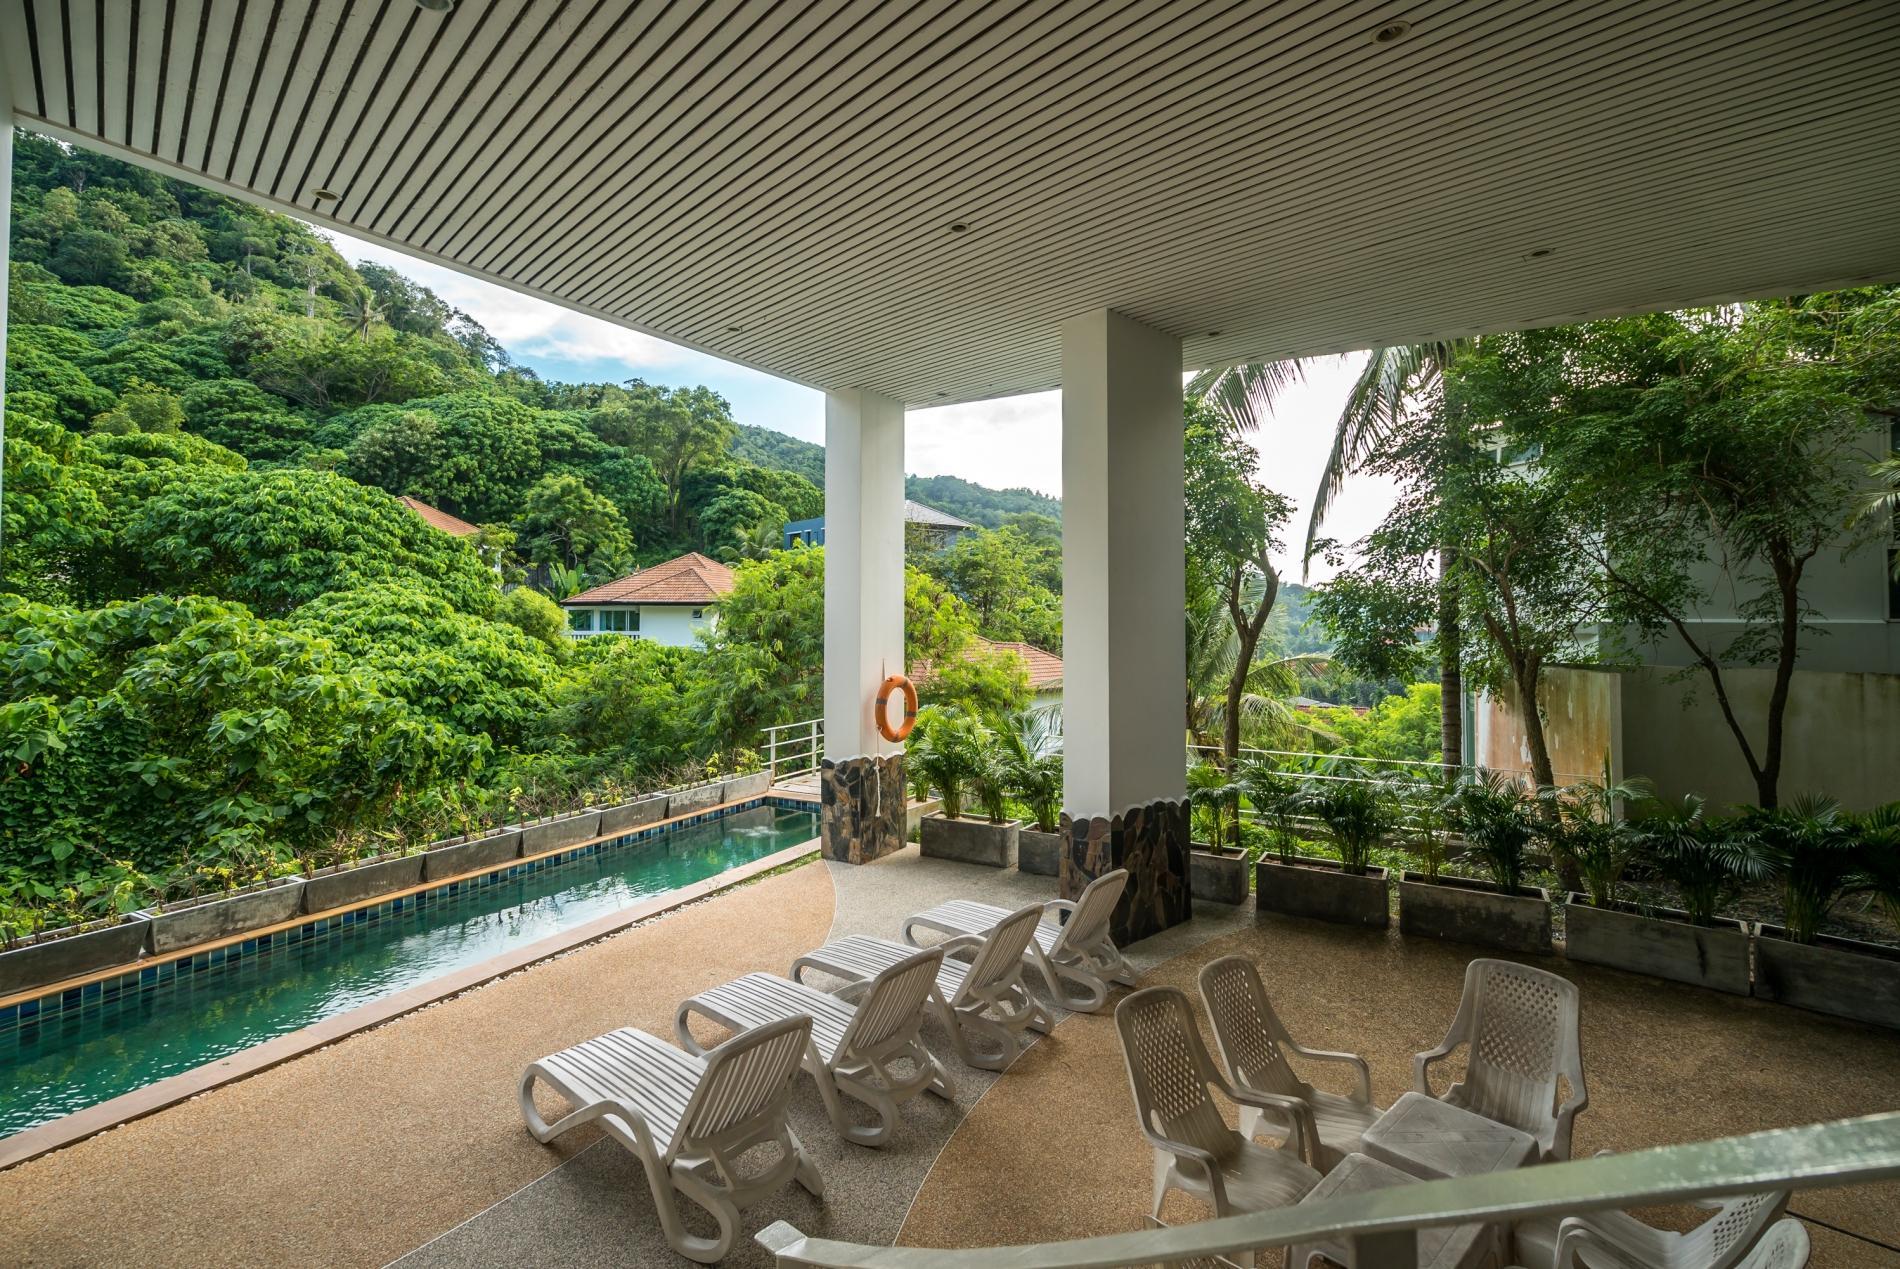 Apartment Kata Ocean View condominium - 1 bdr mountain view apartment photo 20235636